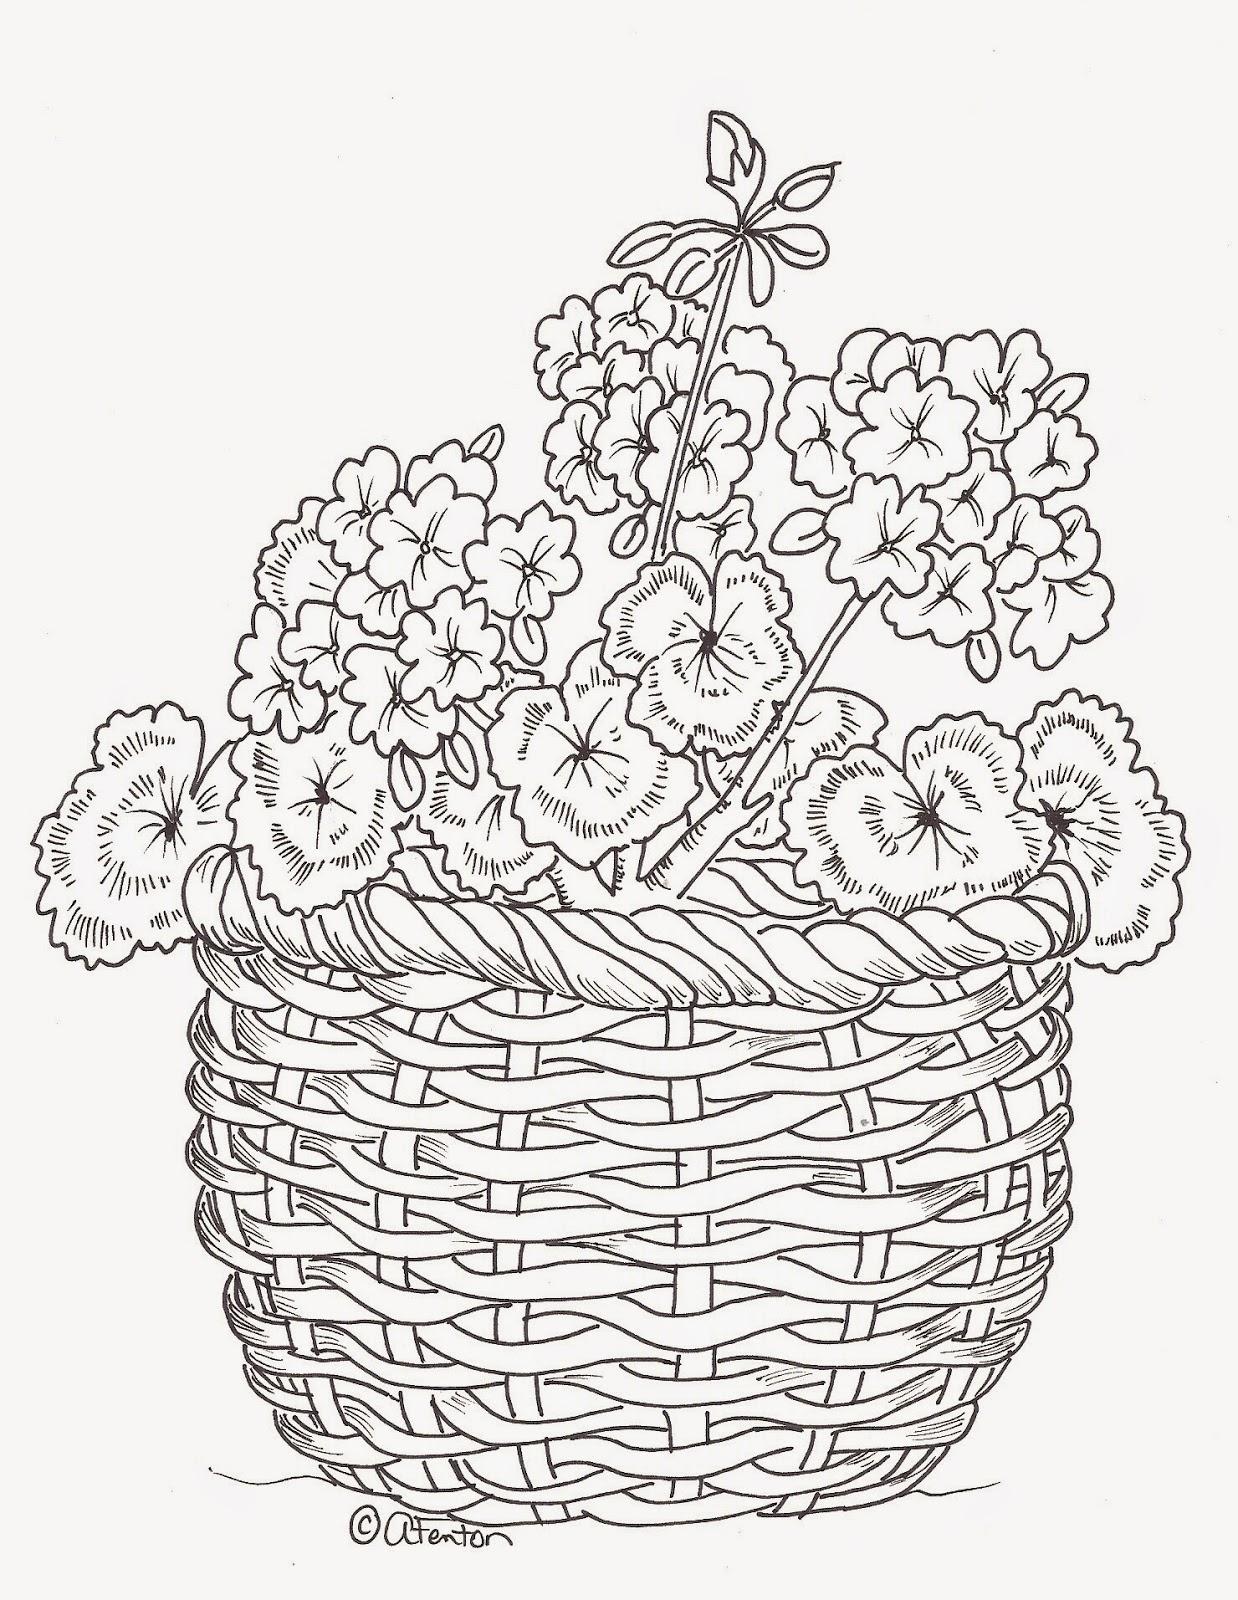 http://2.bp.blogspot.com/-qi72c2VDMYc/VN-uuG91kyI/AAAAAAAADm4/j-lyrn4l_JE/s1600/Flowers%2Bin%2Ba%2BBasket...Anne's%2BDigital%2BArt.jpg